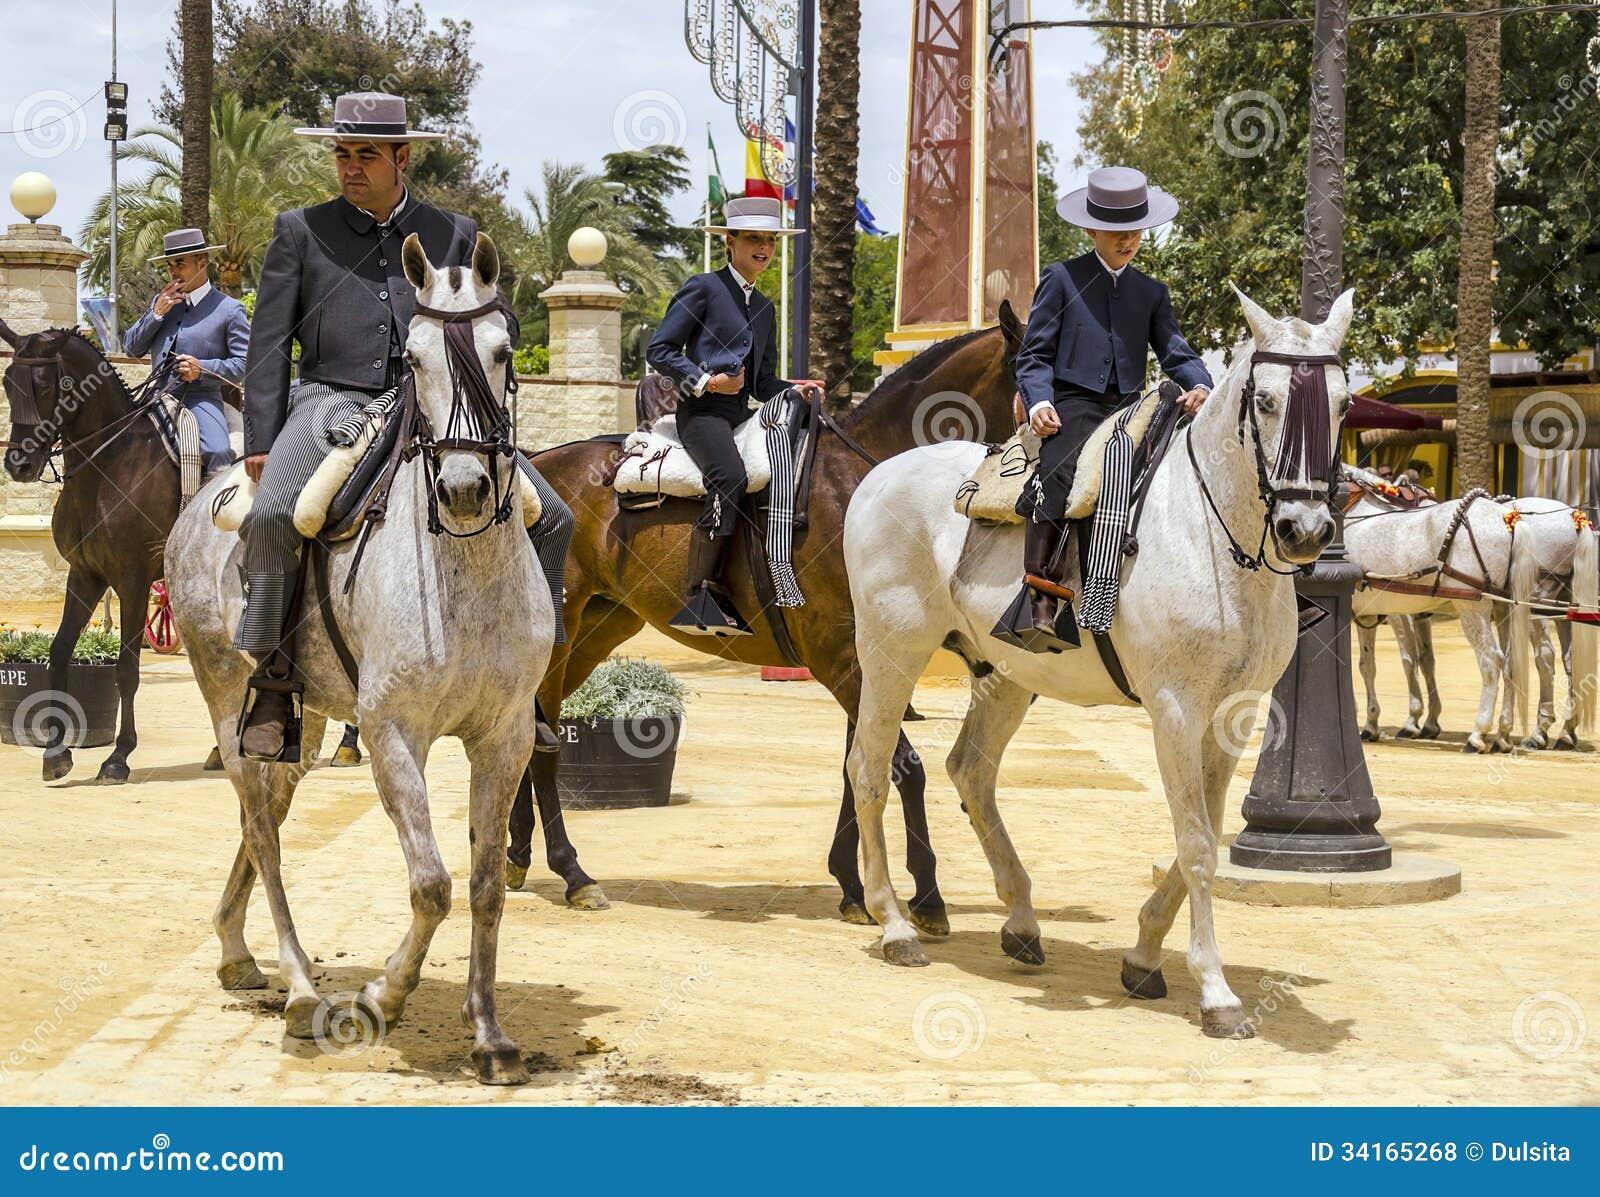 Horses Editorial Stock Photo Image 34165268